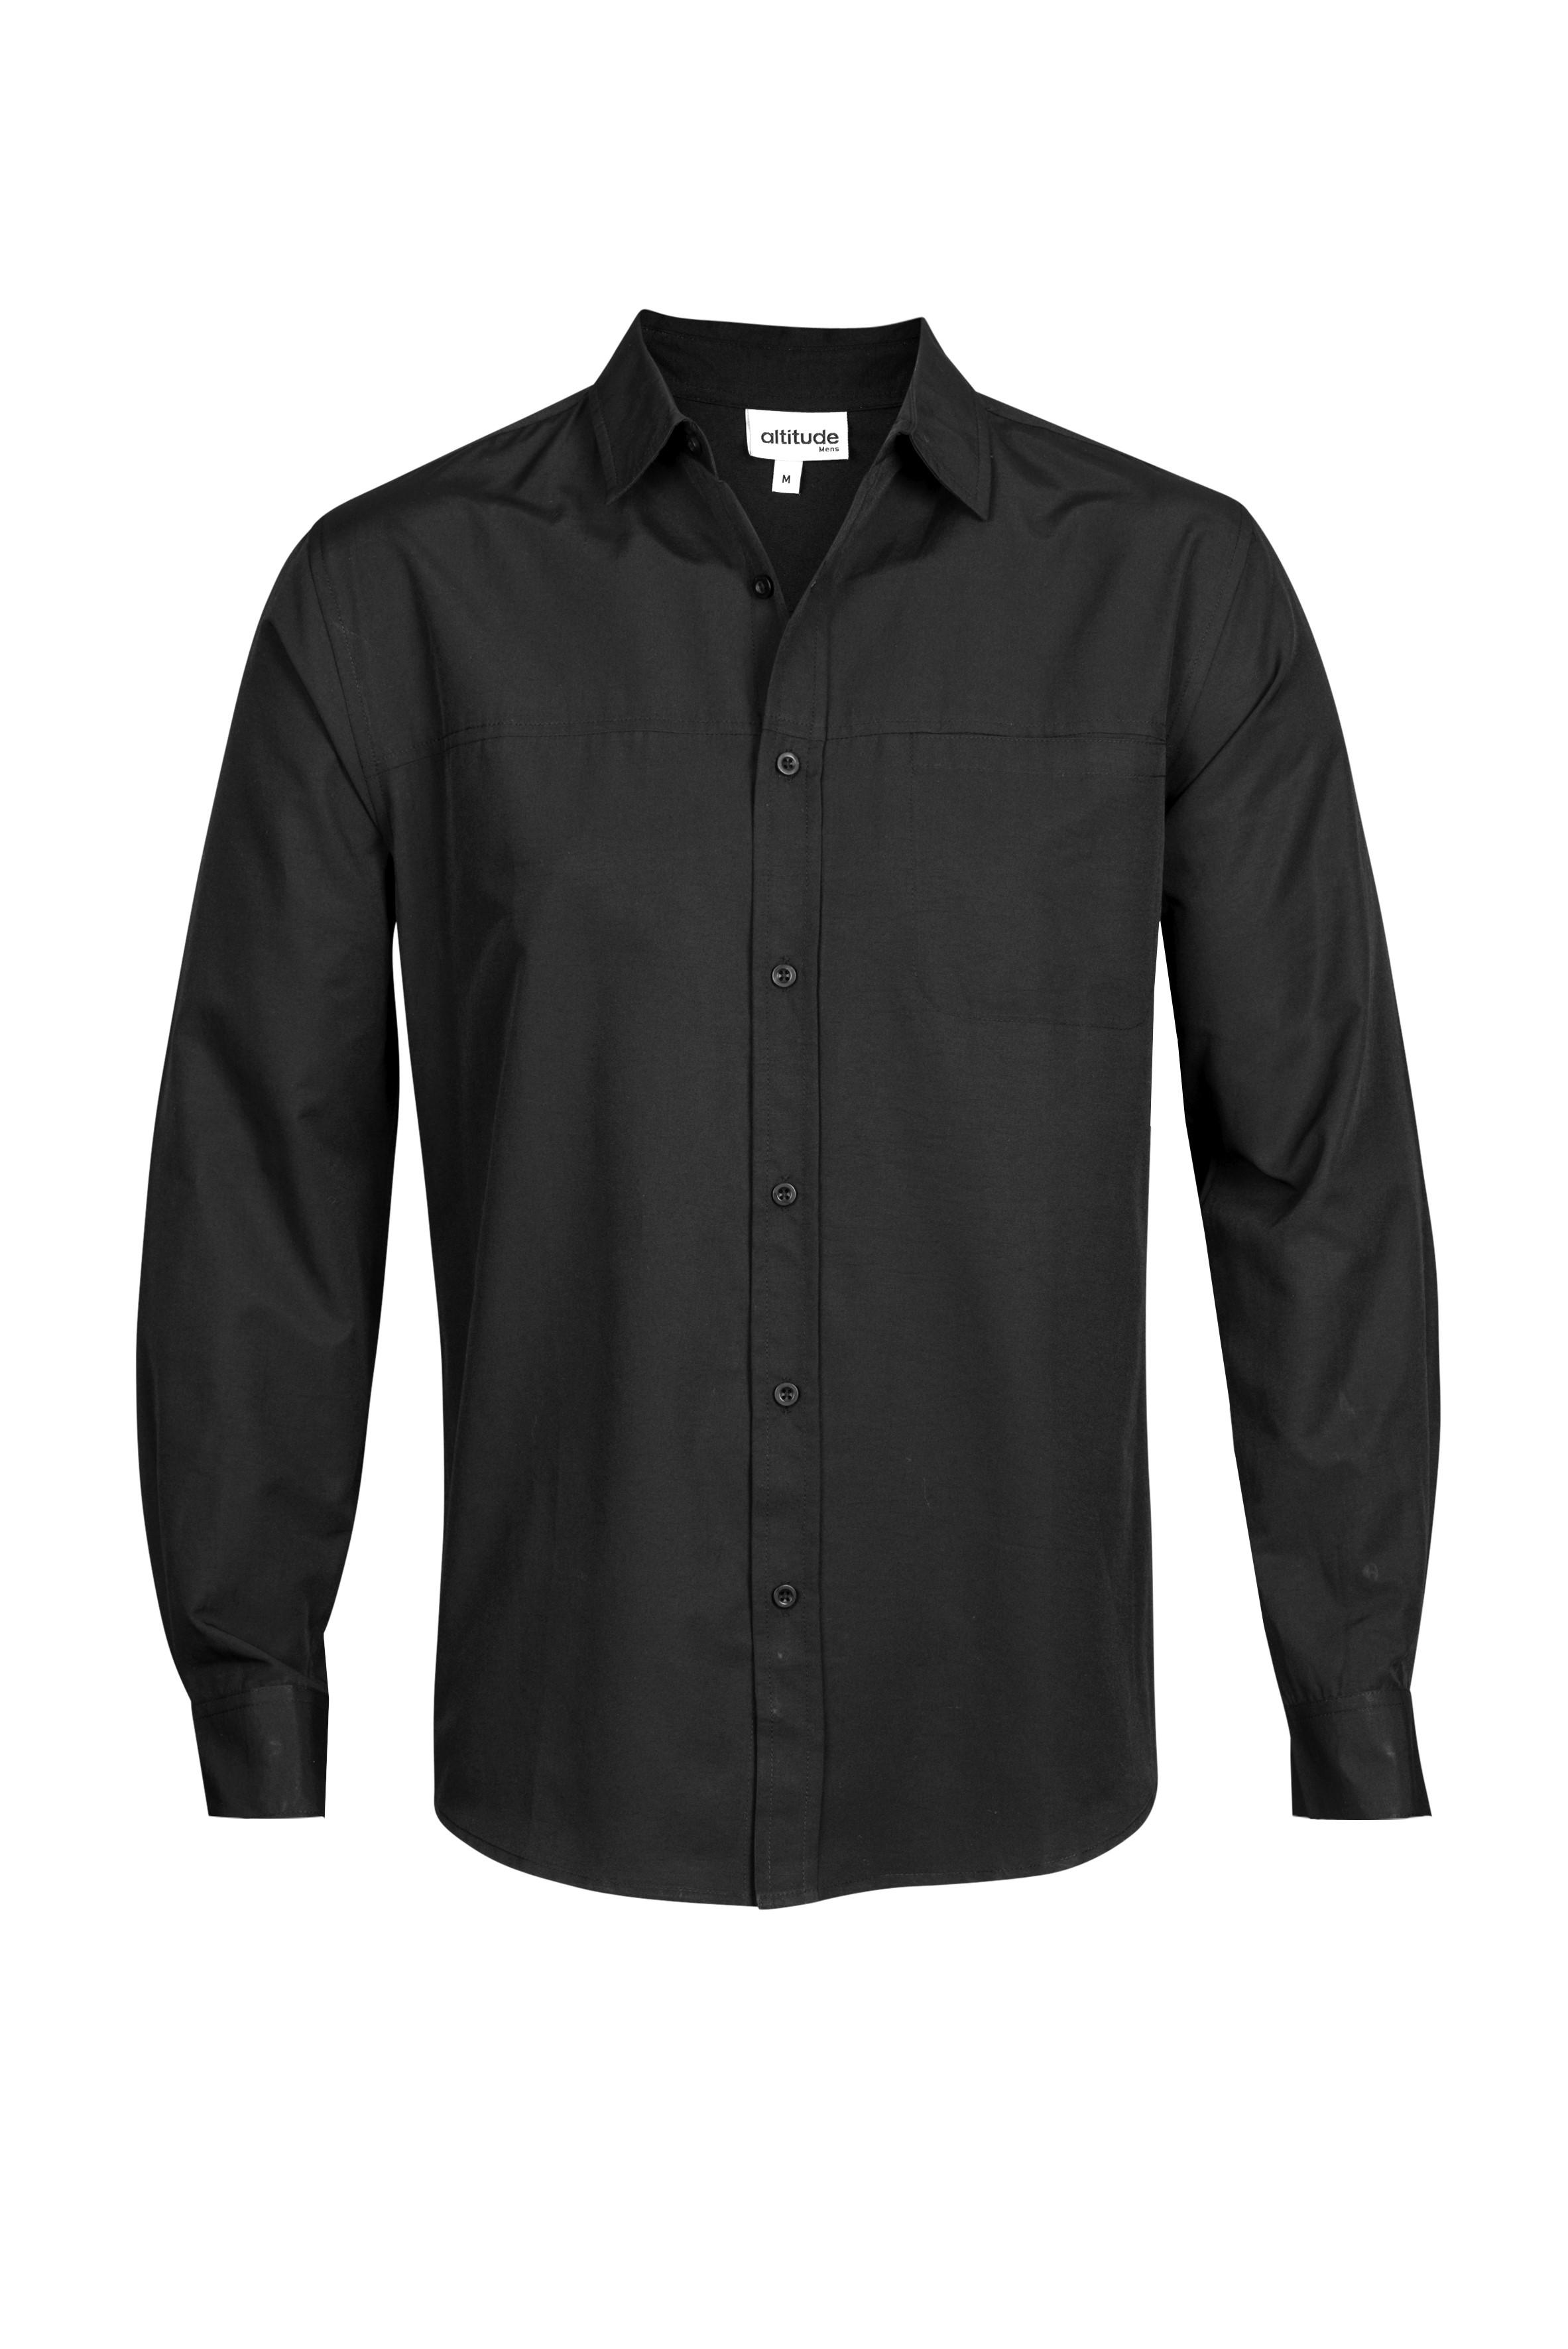 Mens Long Sleeve Empire Shirt